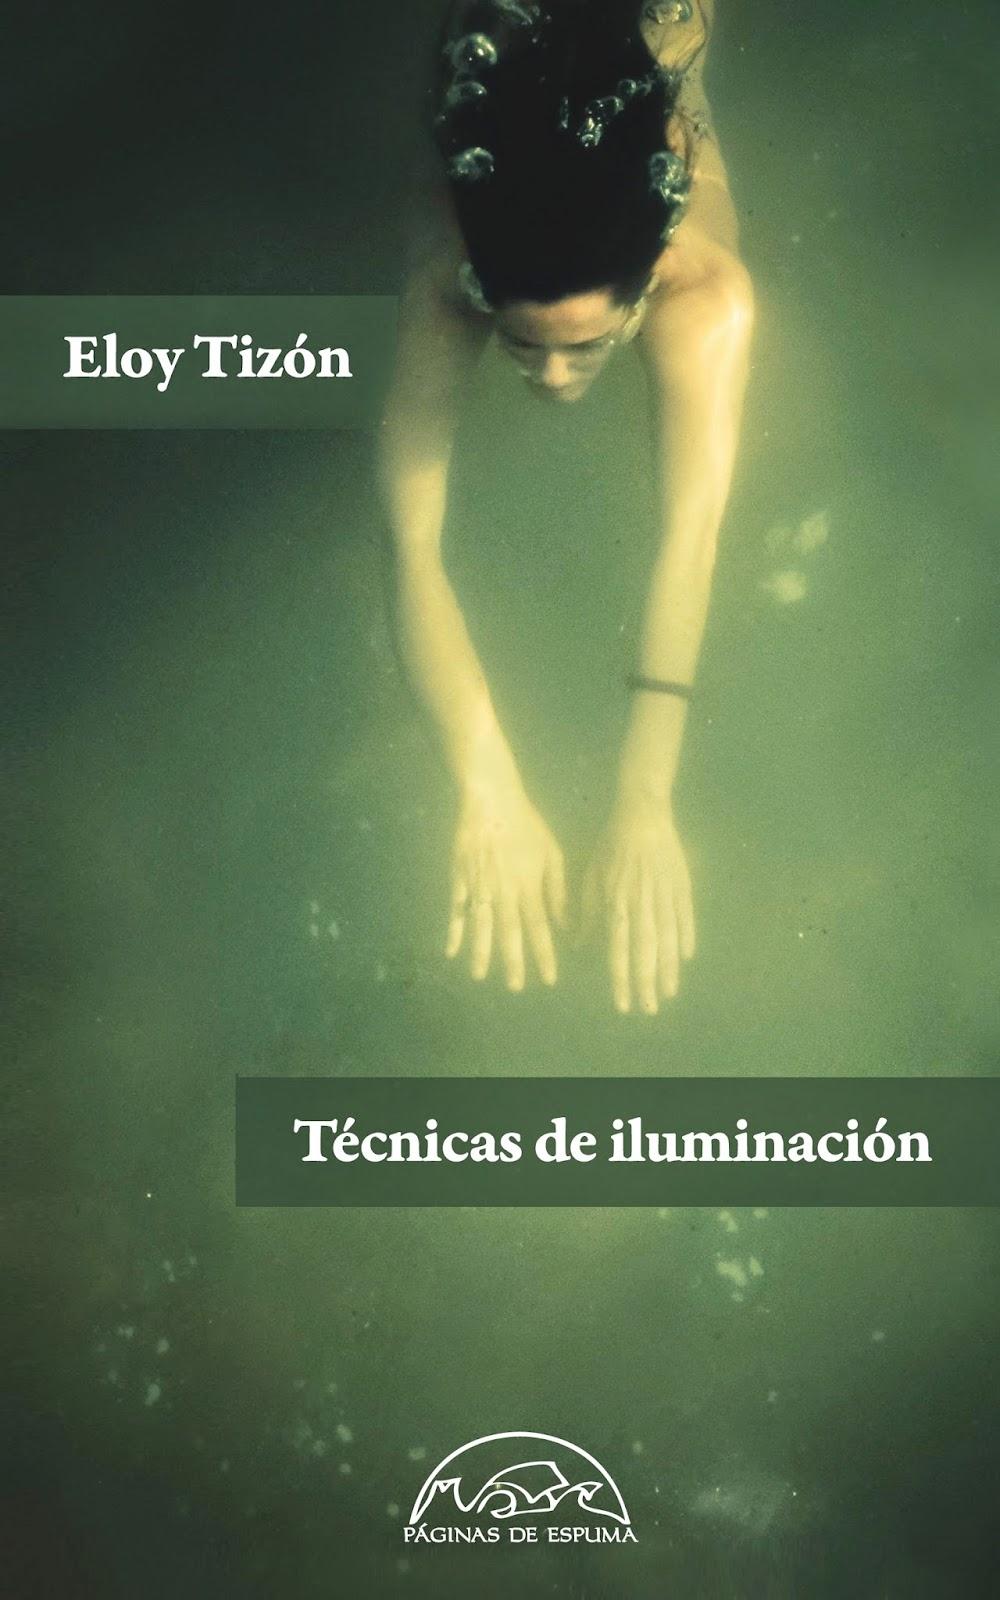 Eloy Tizon